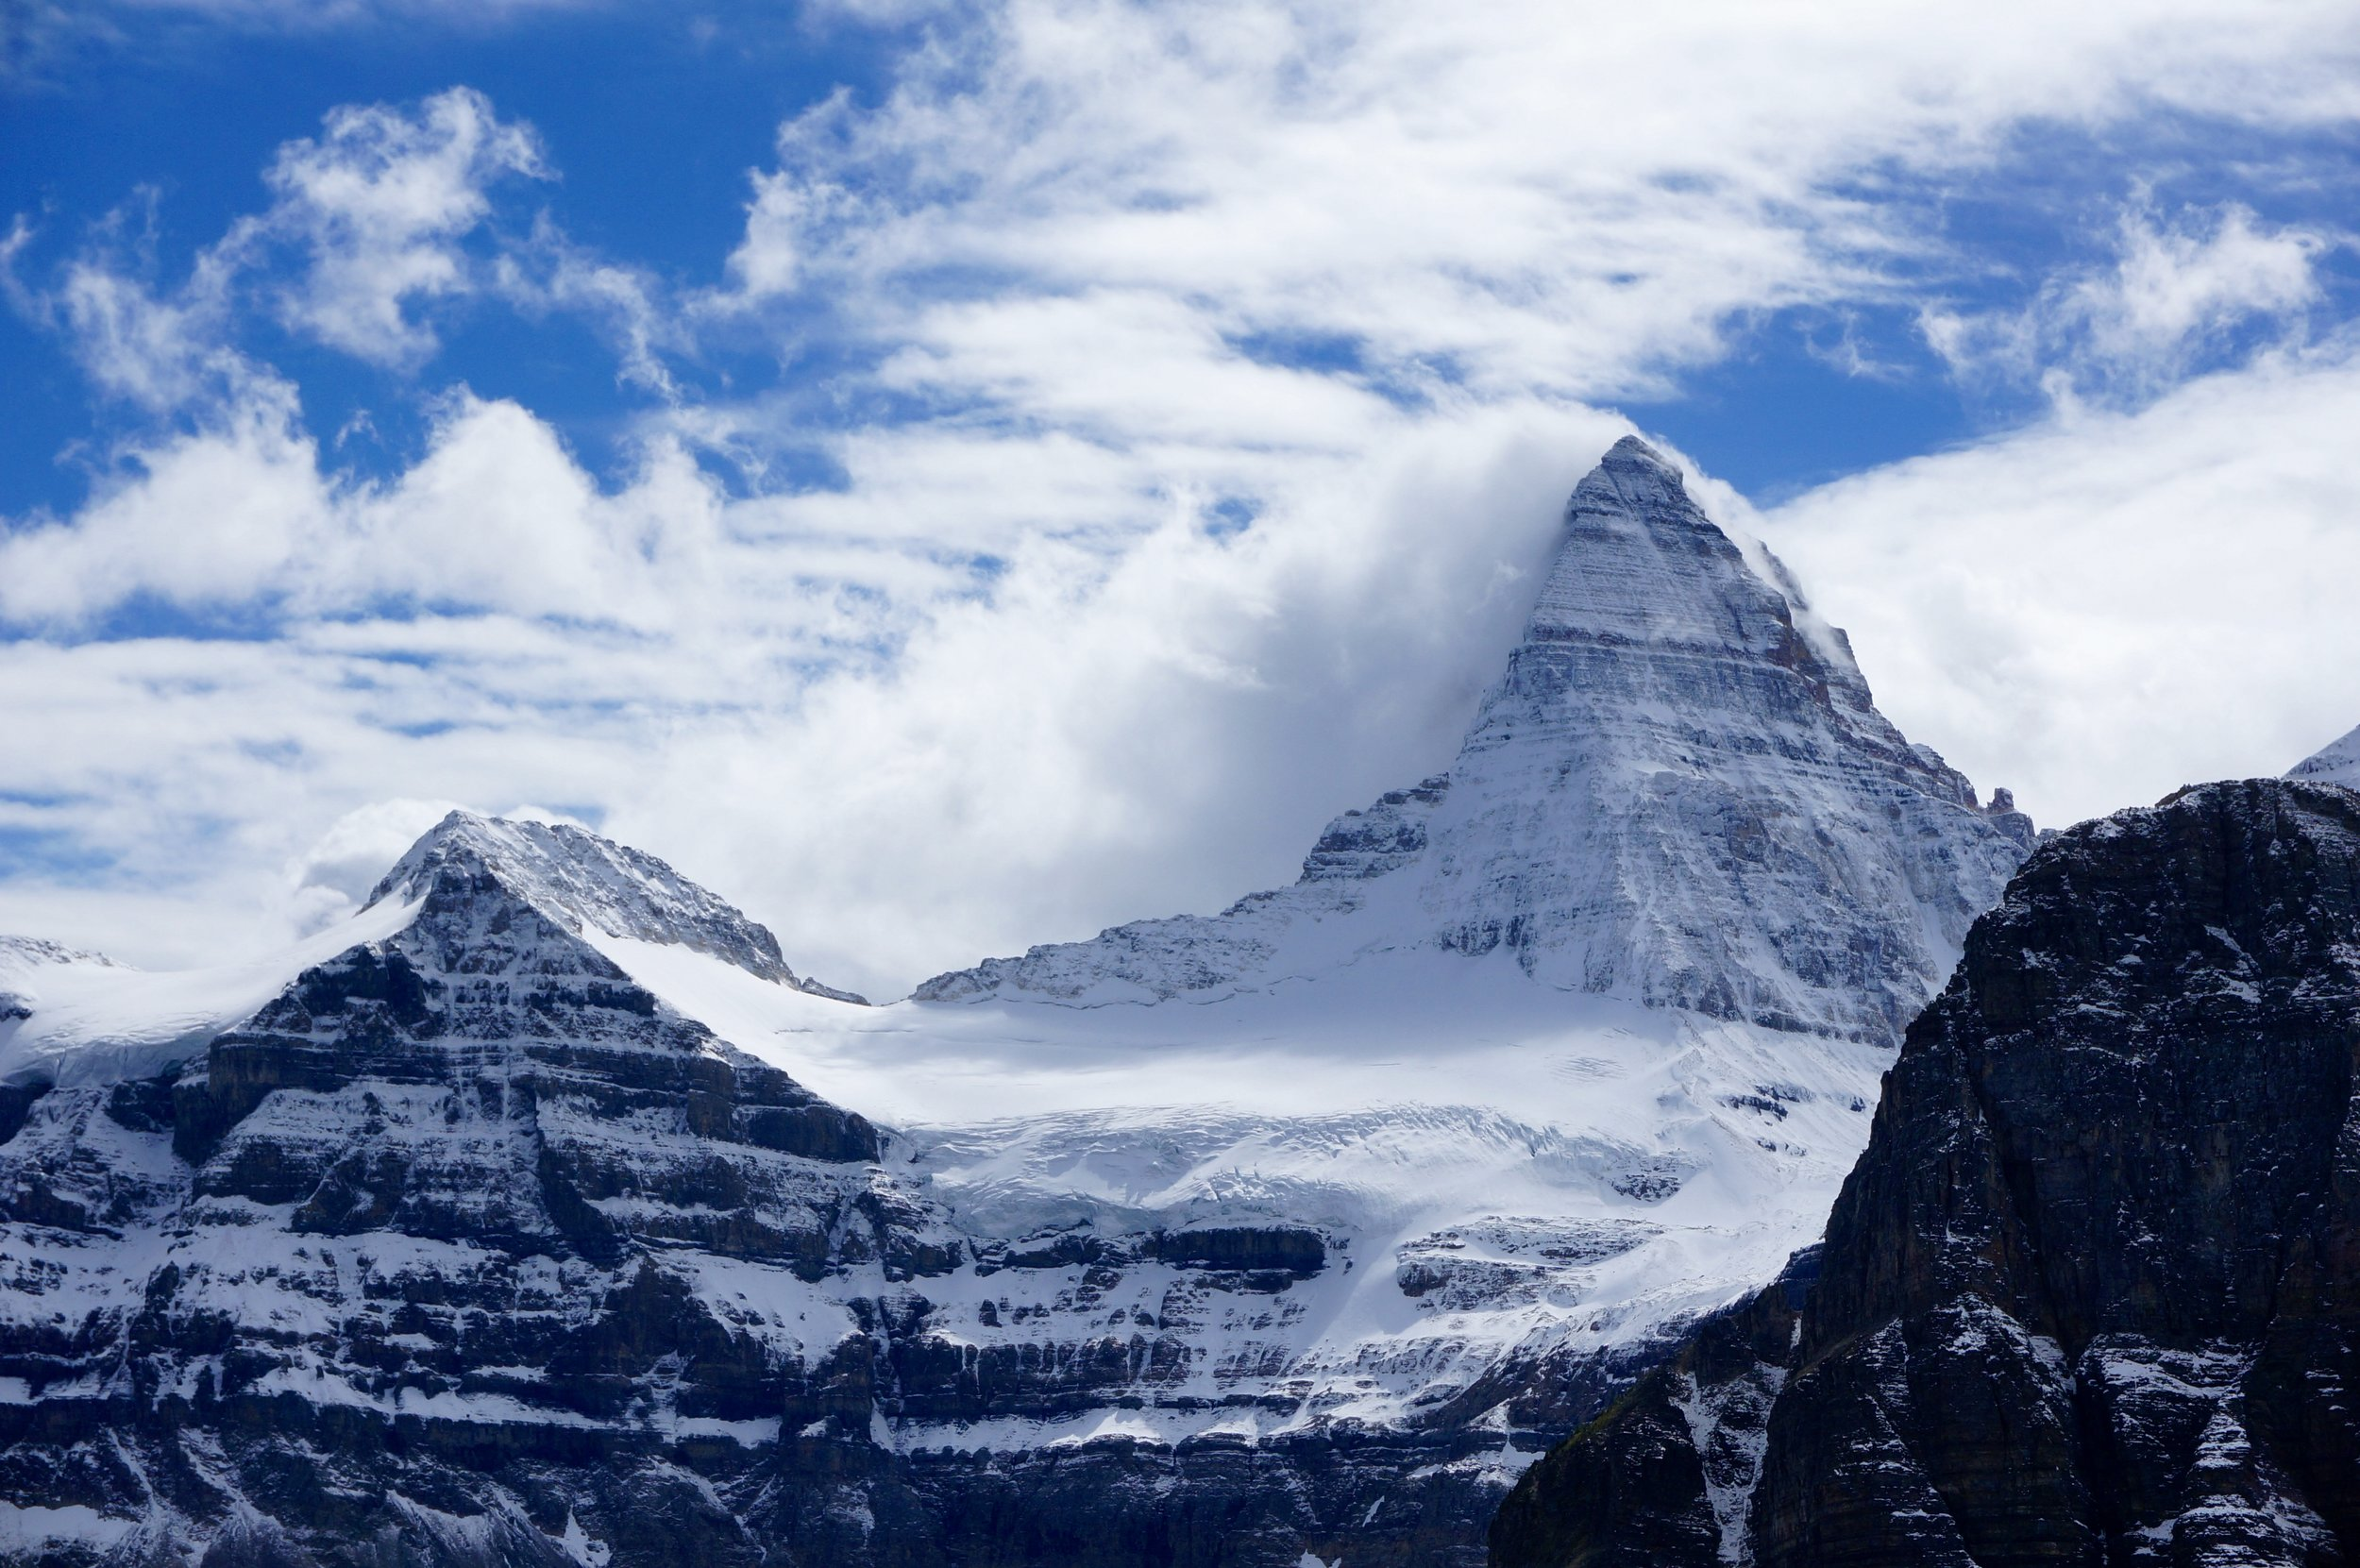 Backpacking To Mount Assiniboine Maura Brady